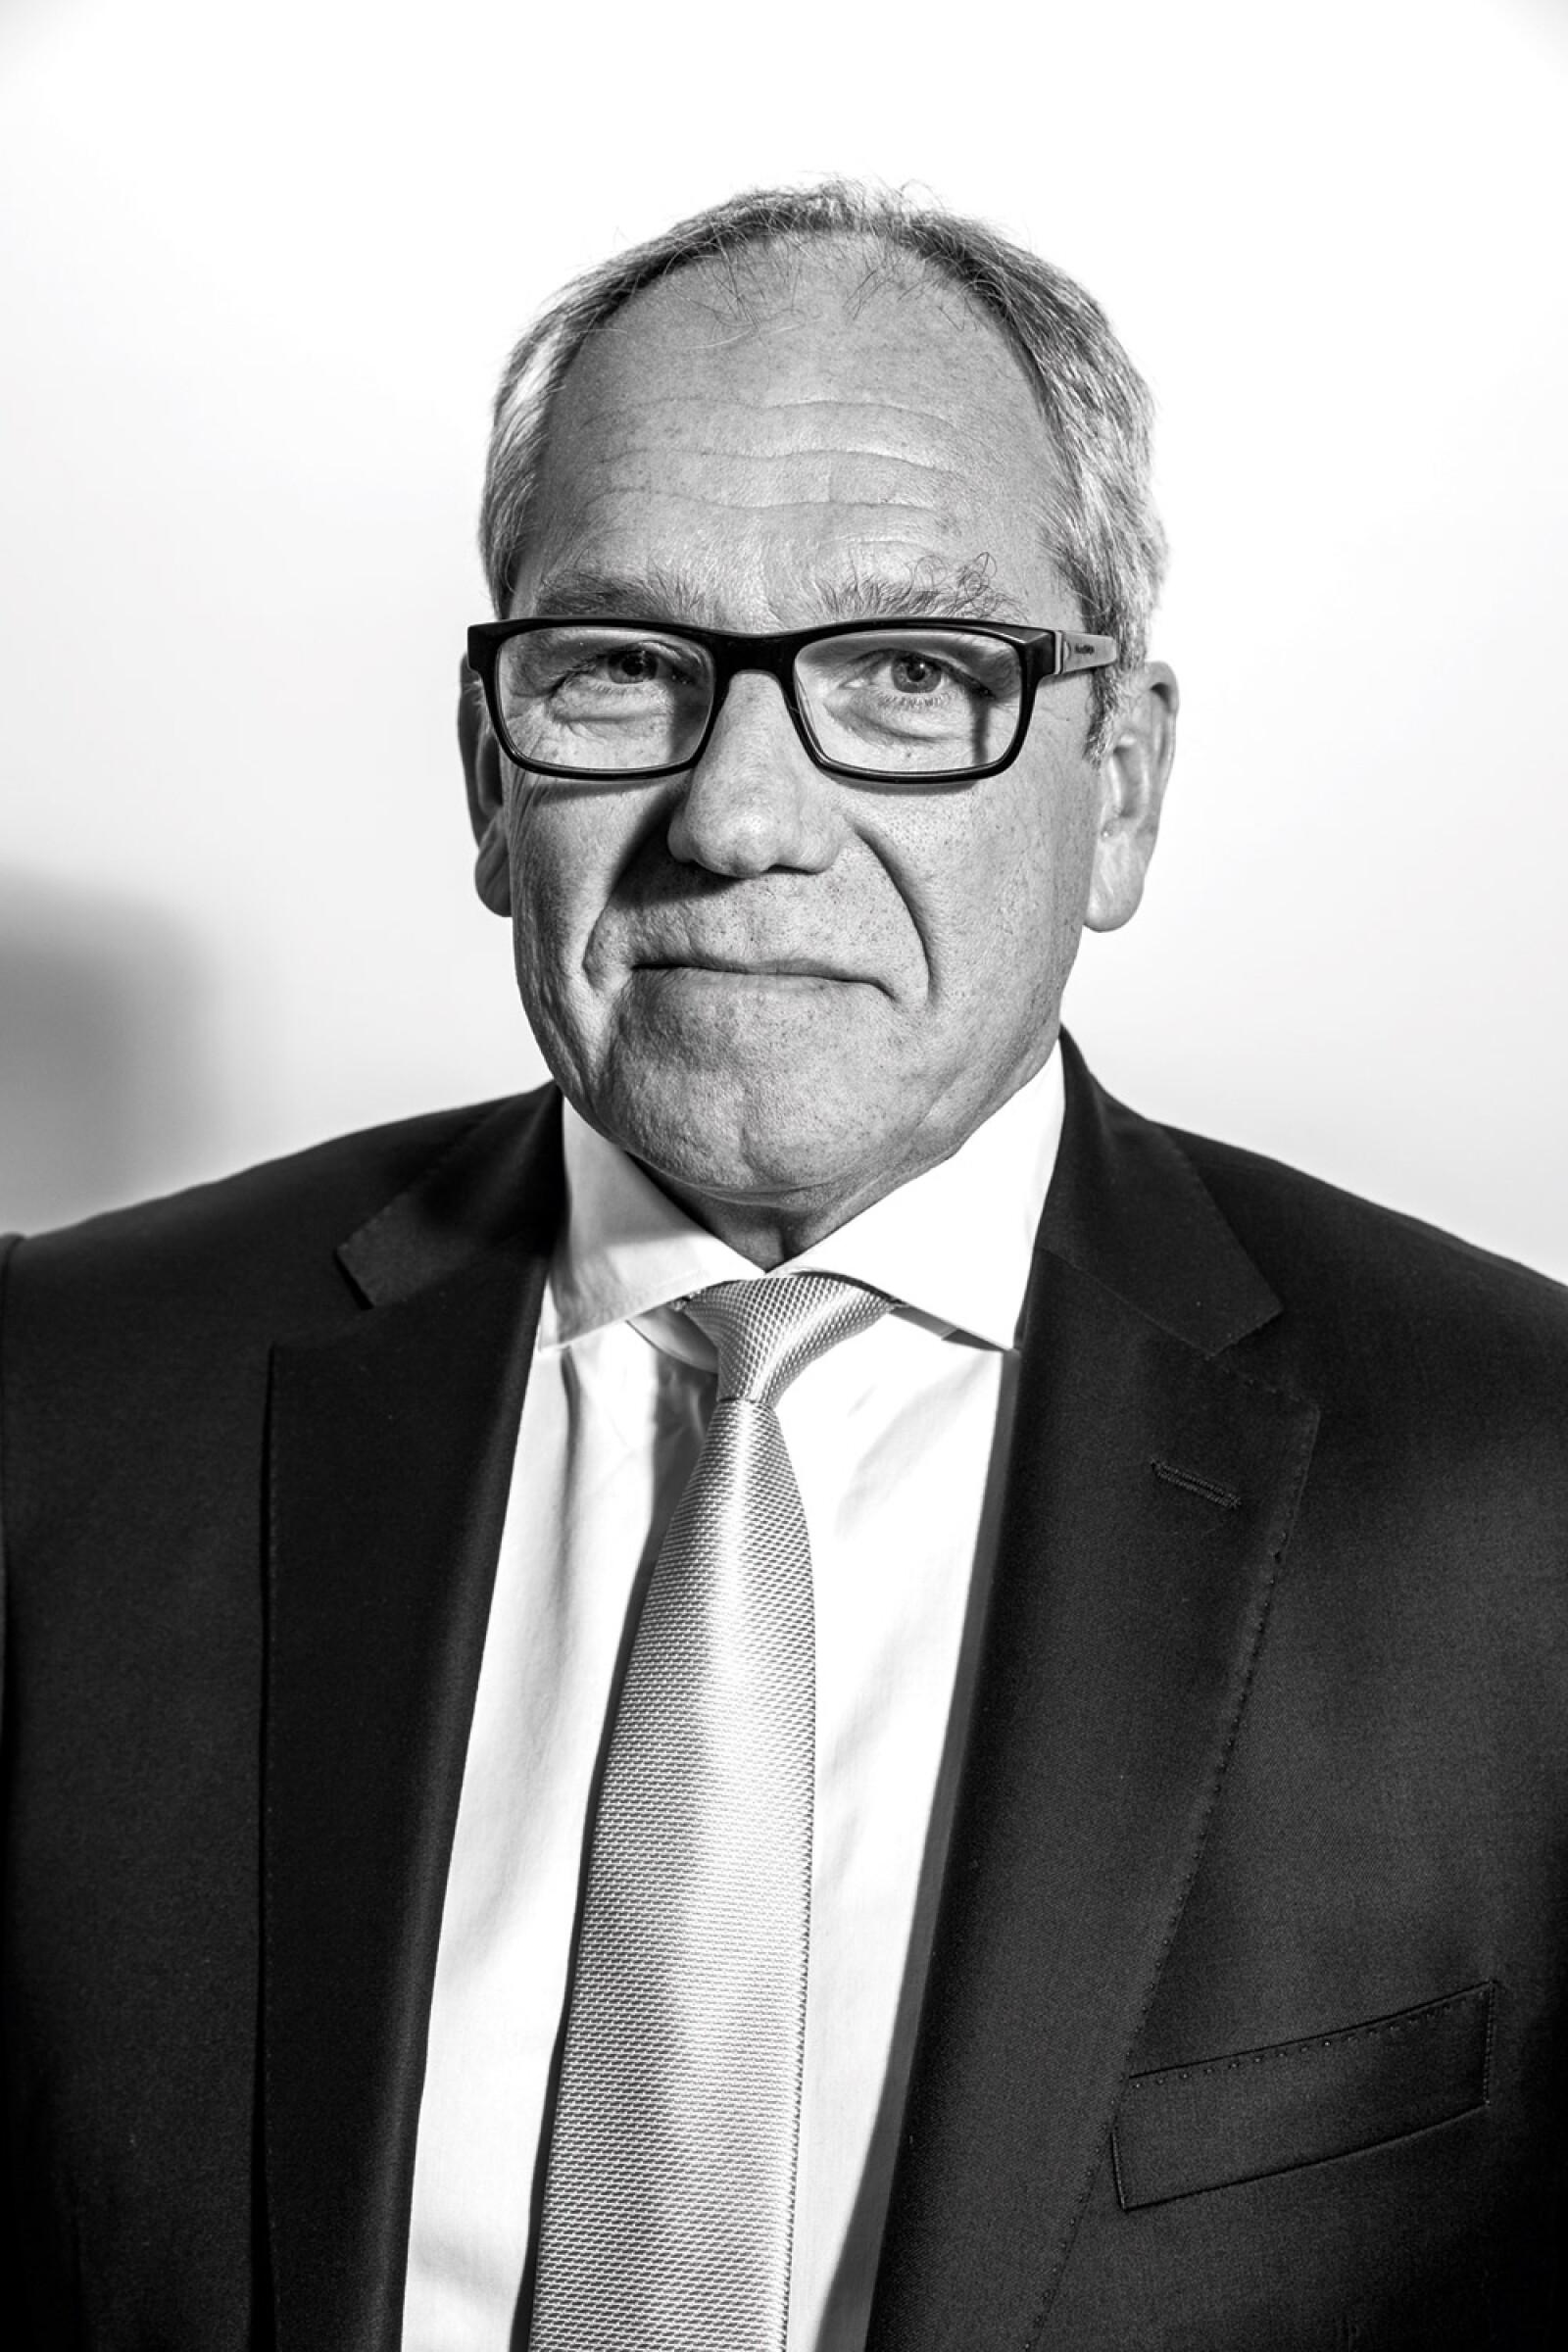 Hermann Bohrer, presidente y CEO de BMW Group Planta SLP